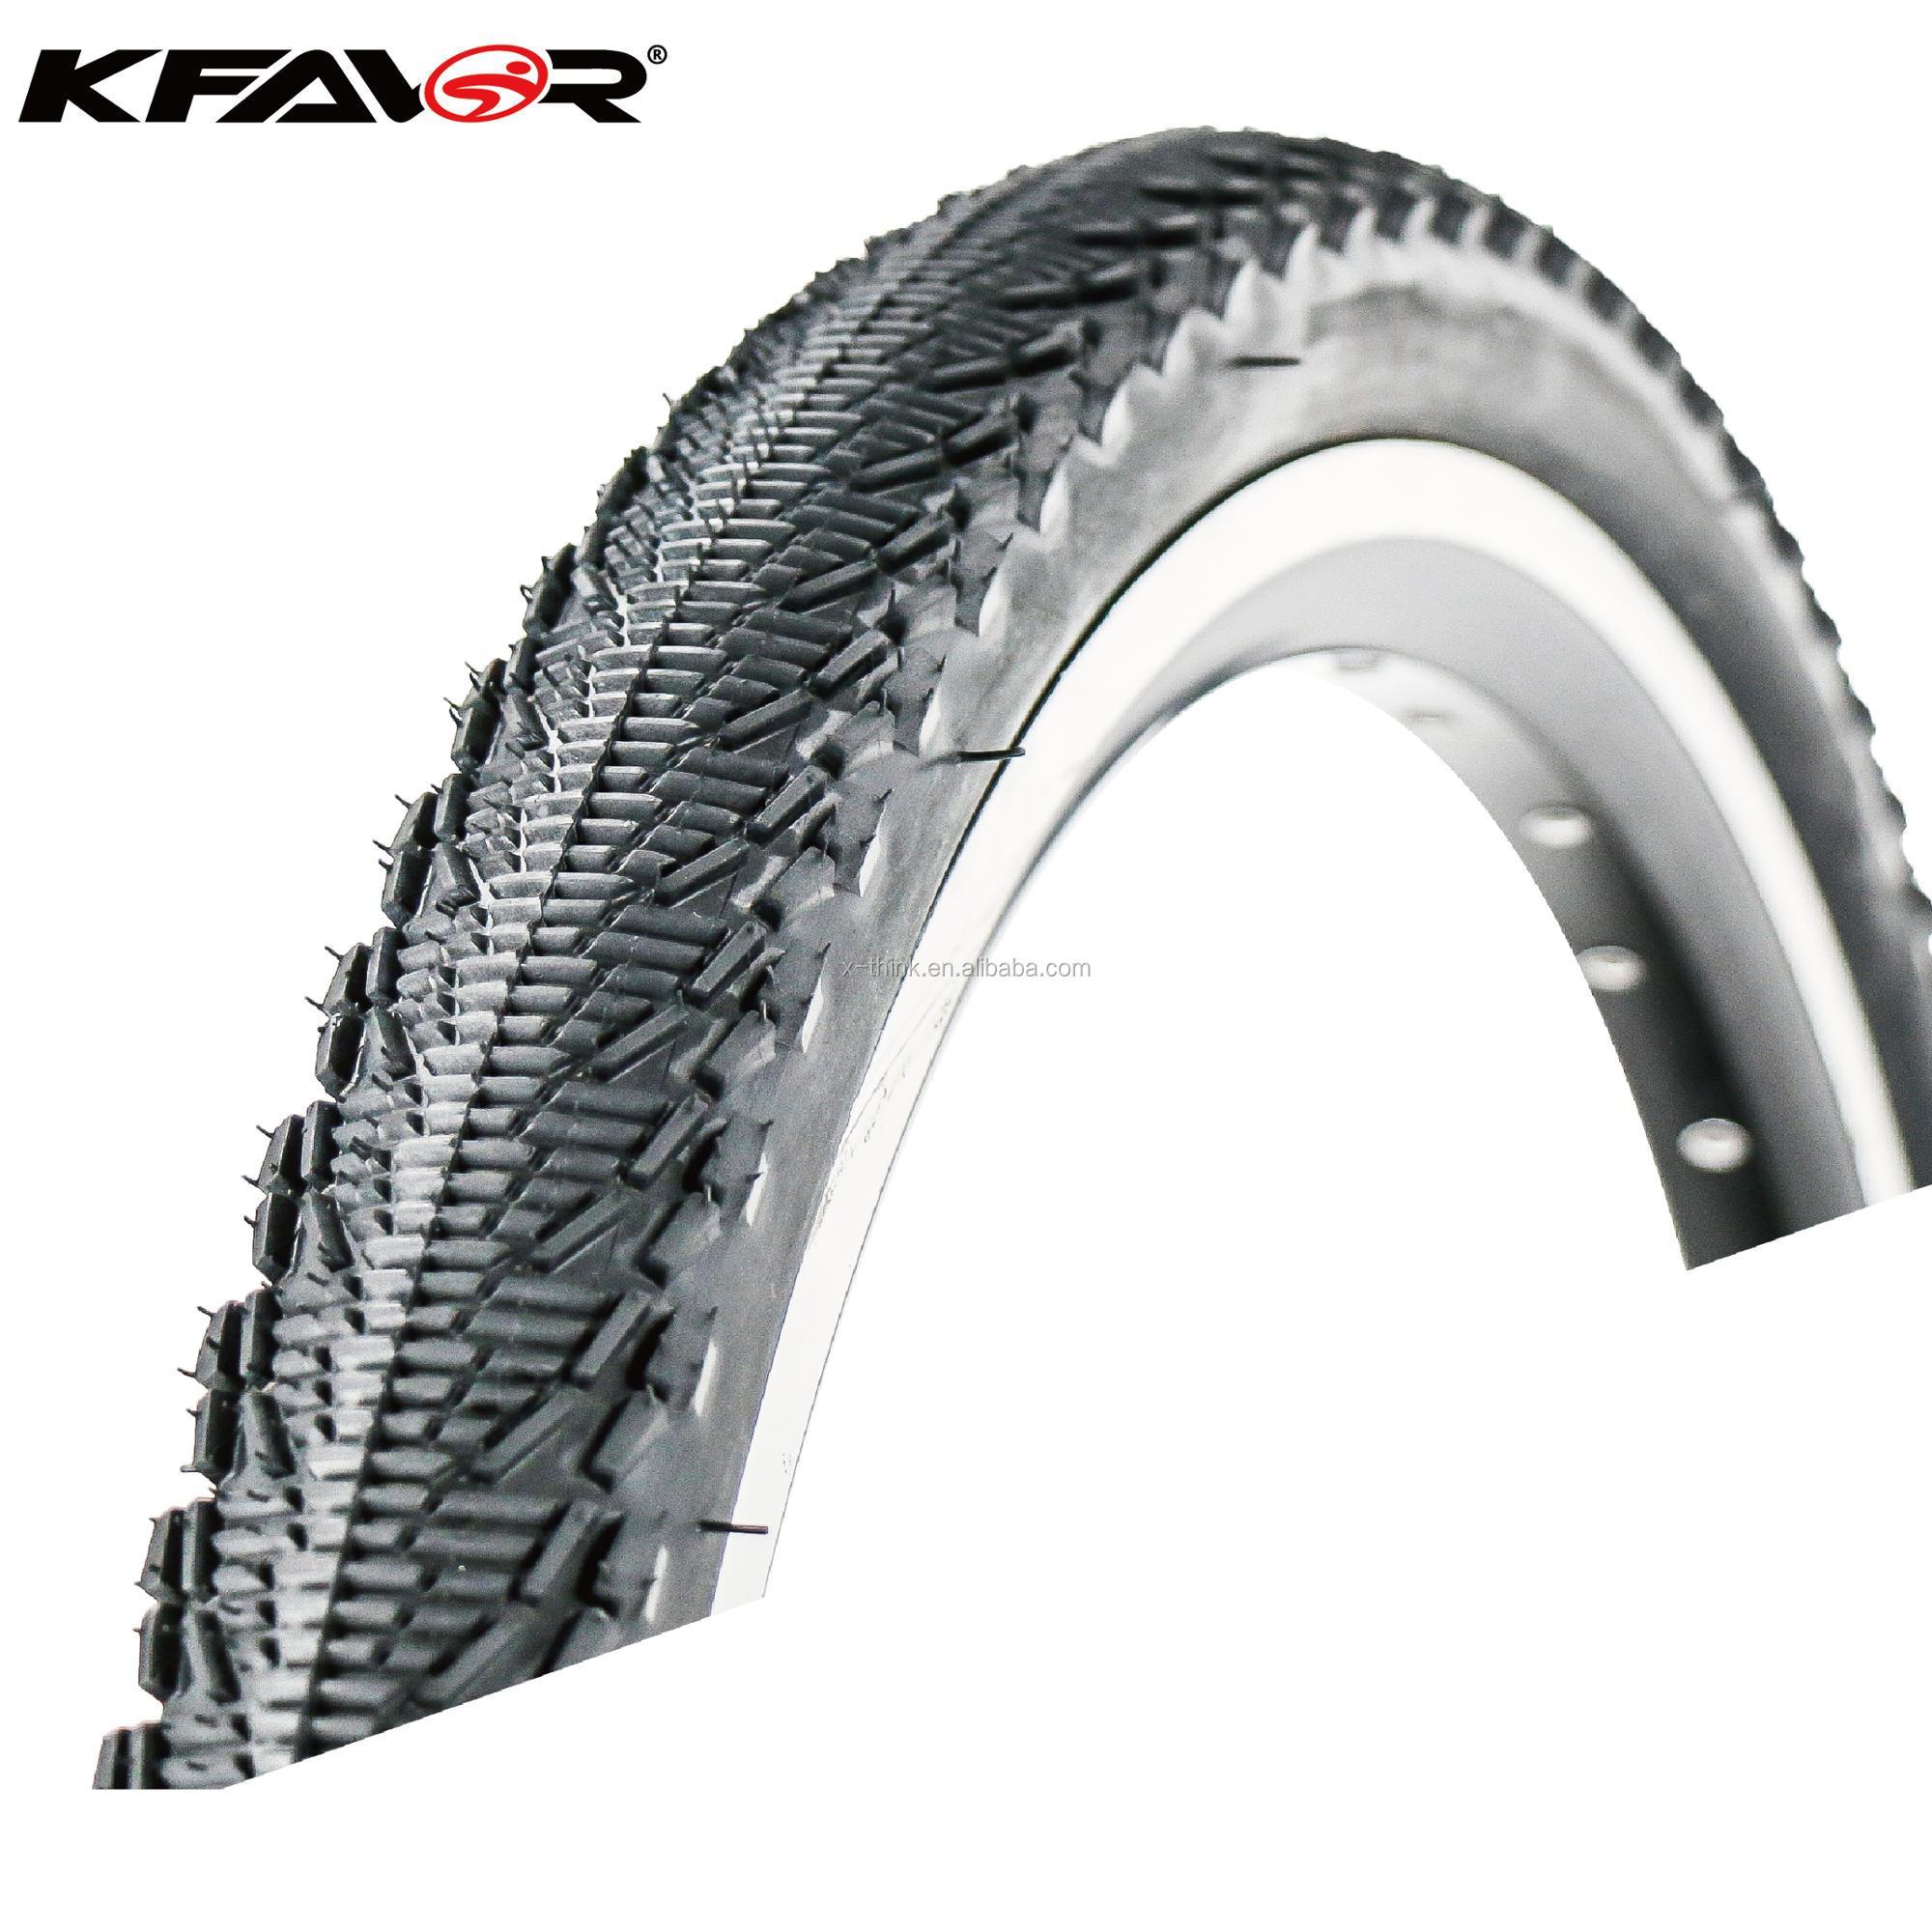 Pair //Set Bike Bicycle Scooter Stroller Tires 12 1//2 x 2 1//4 black 12 x 2.125